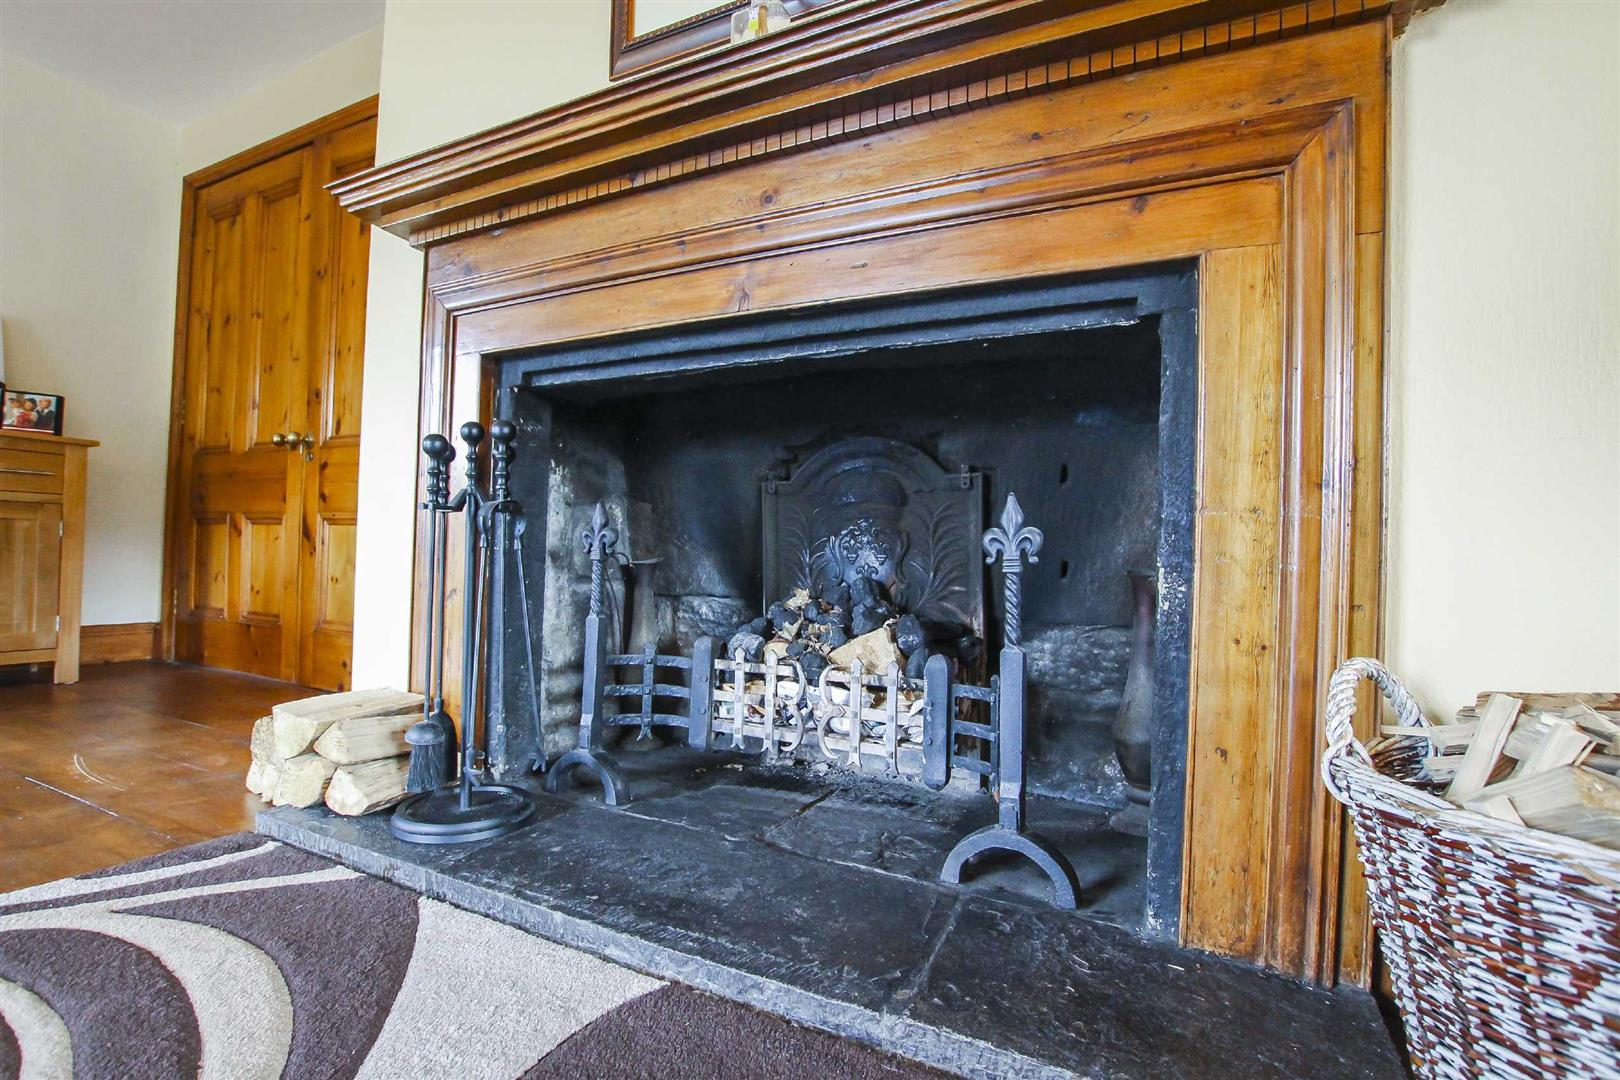 5 Bedroom Barn Conversion For Sale - p026519_20.jpg